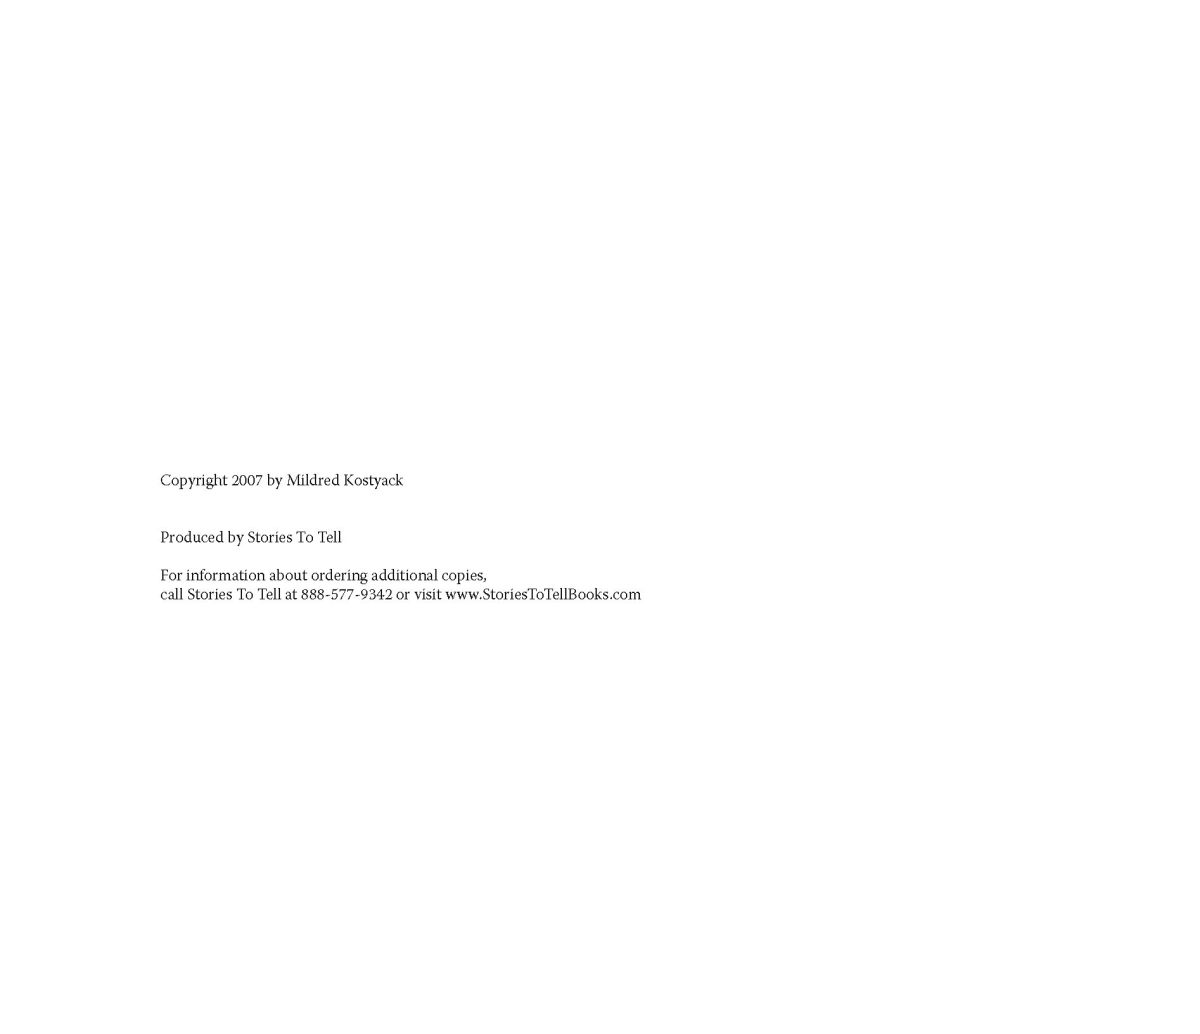 binder2_page_04.jpg